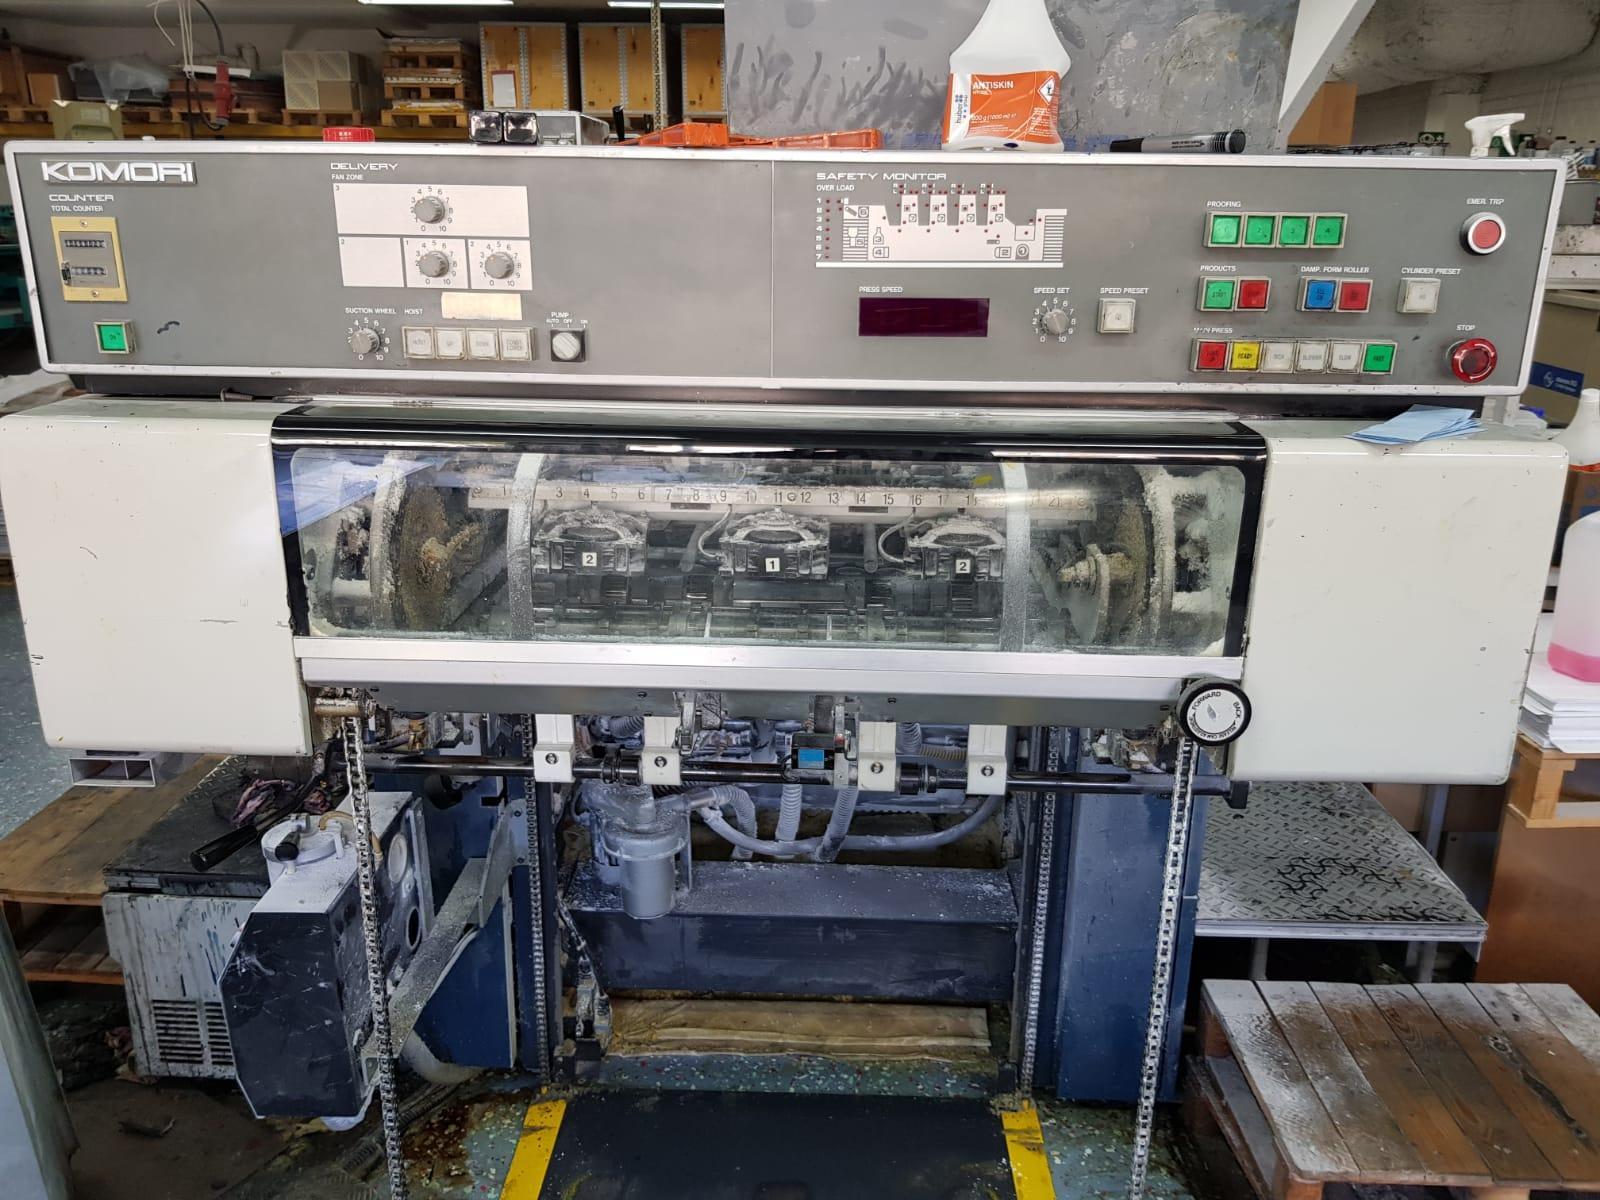 Komori Lithrone 426, 1990 Offset Printing Machine